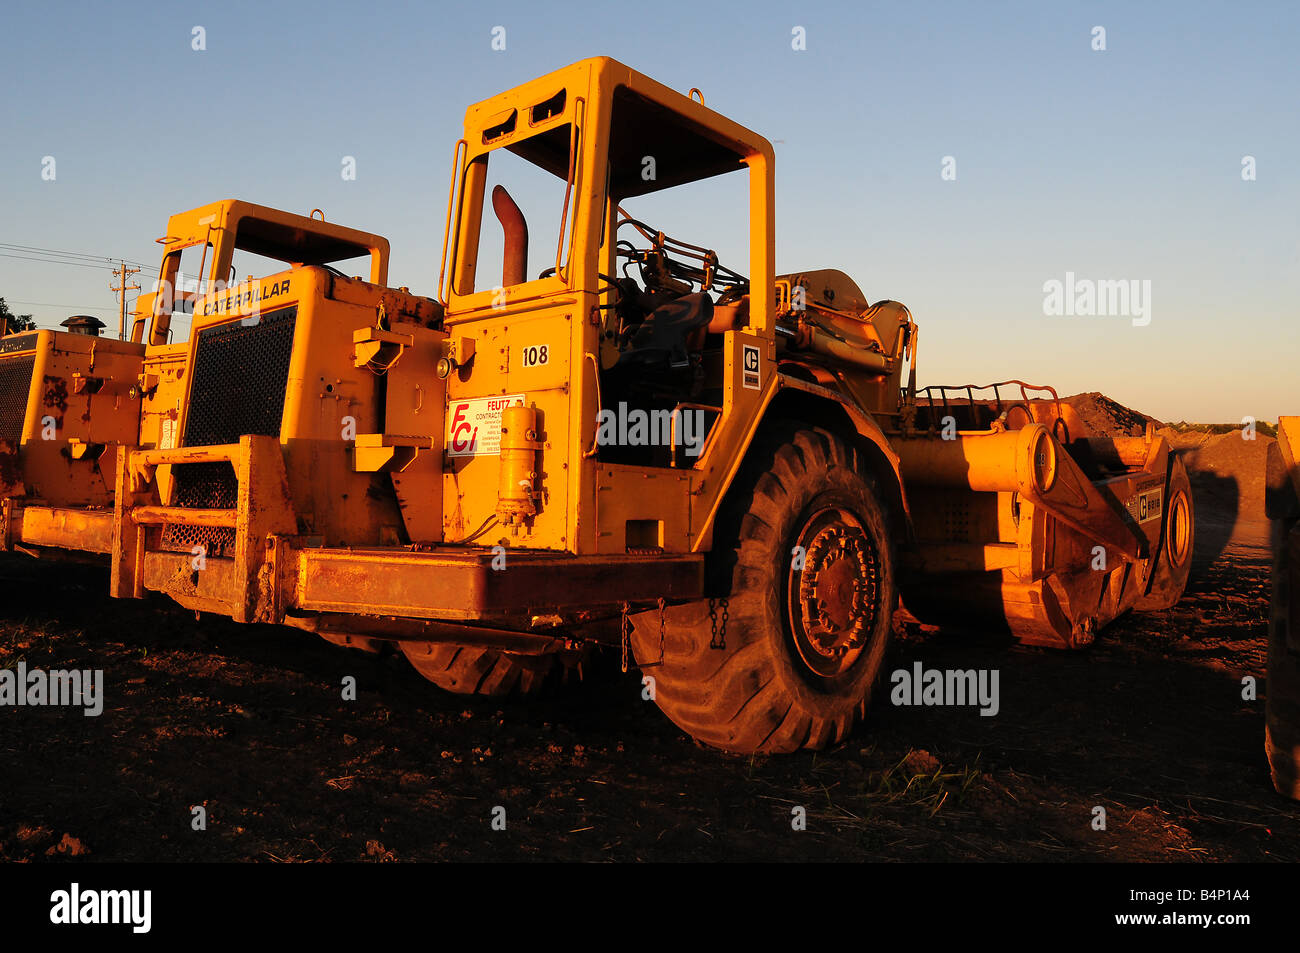 Cat or Caterpillar scraper or earth mover construction equipment - Stock Image